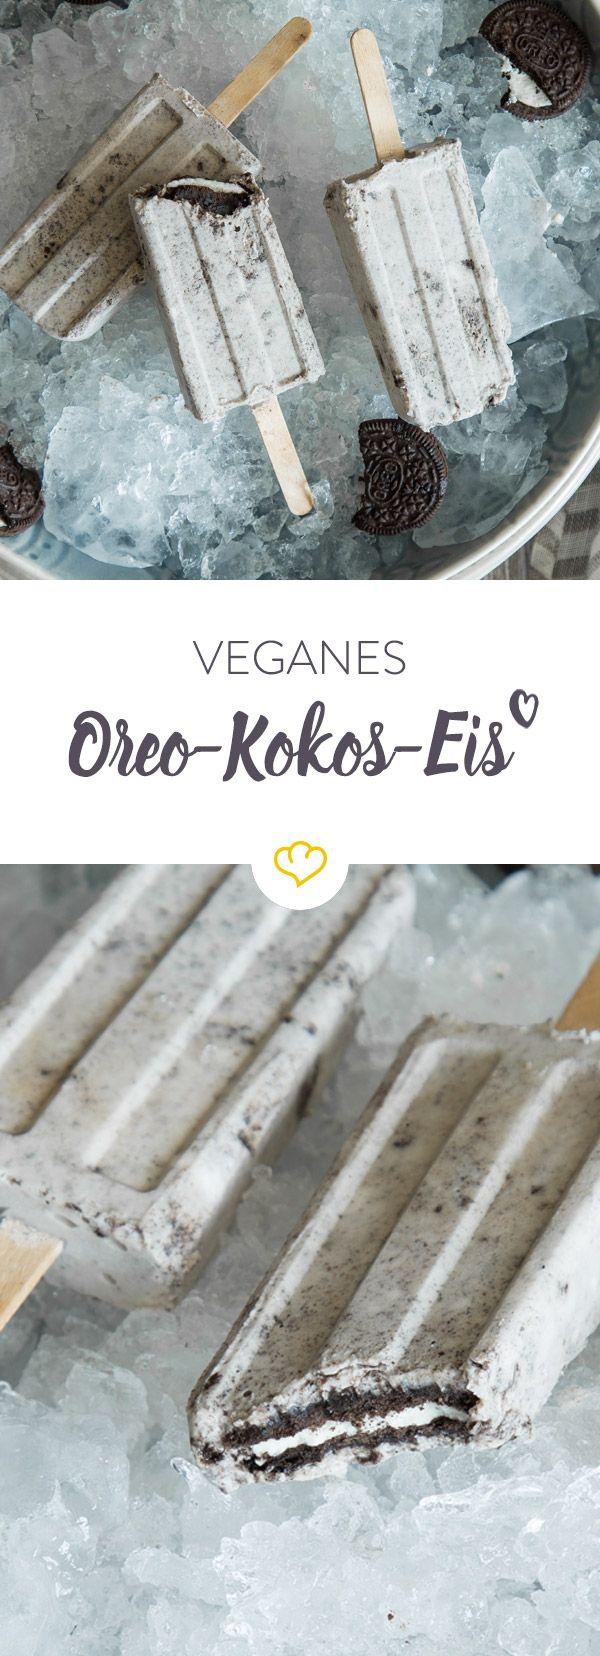 Veganes Oreo-Kokos-Eis am Stiel #bananadessertrecipes